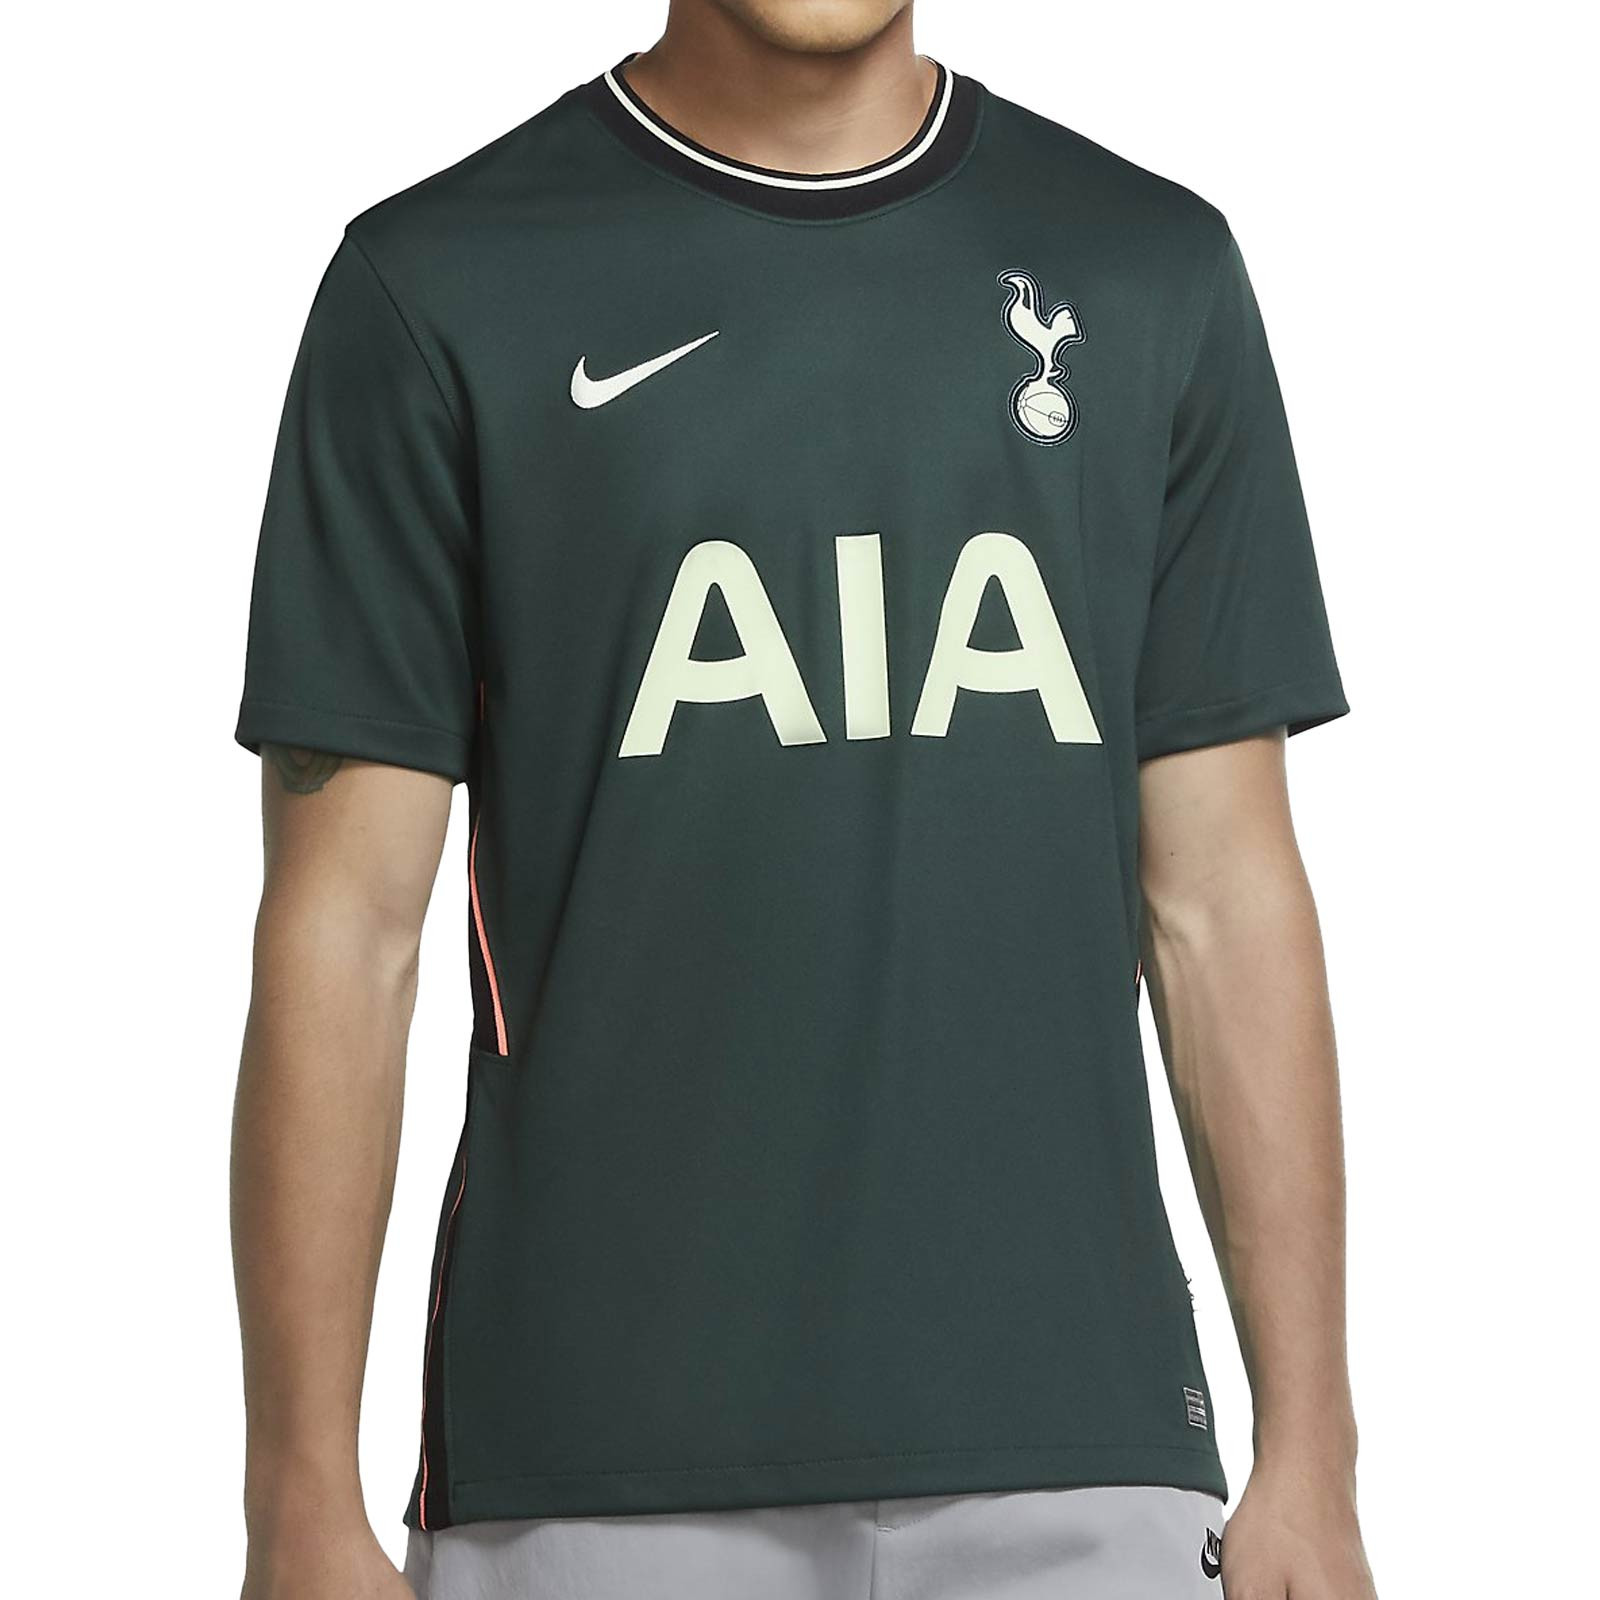 cómo enfocar Rebobinar  Camiseta Nike 2a Tottenham 2020 2021 Stadium | futbolmania